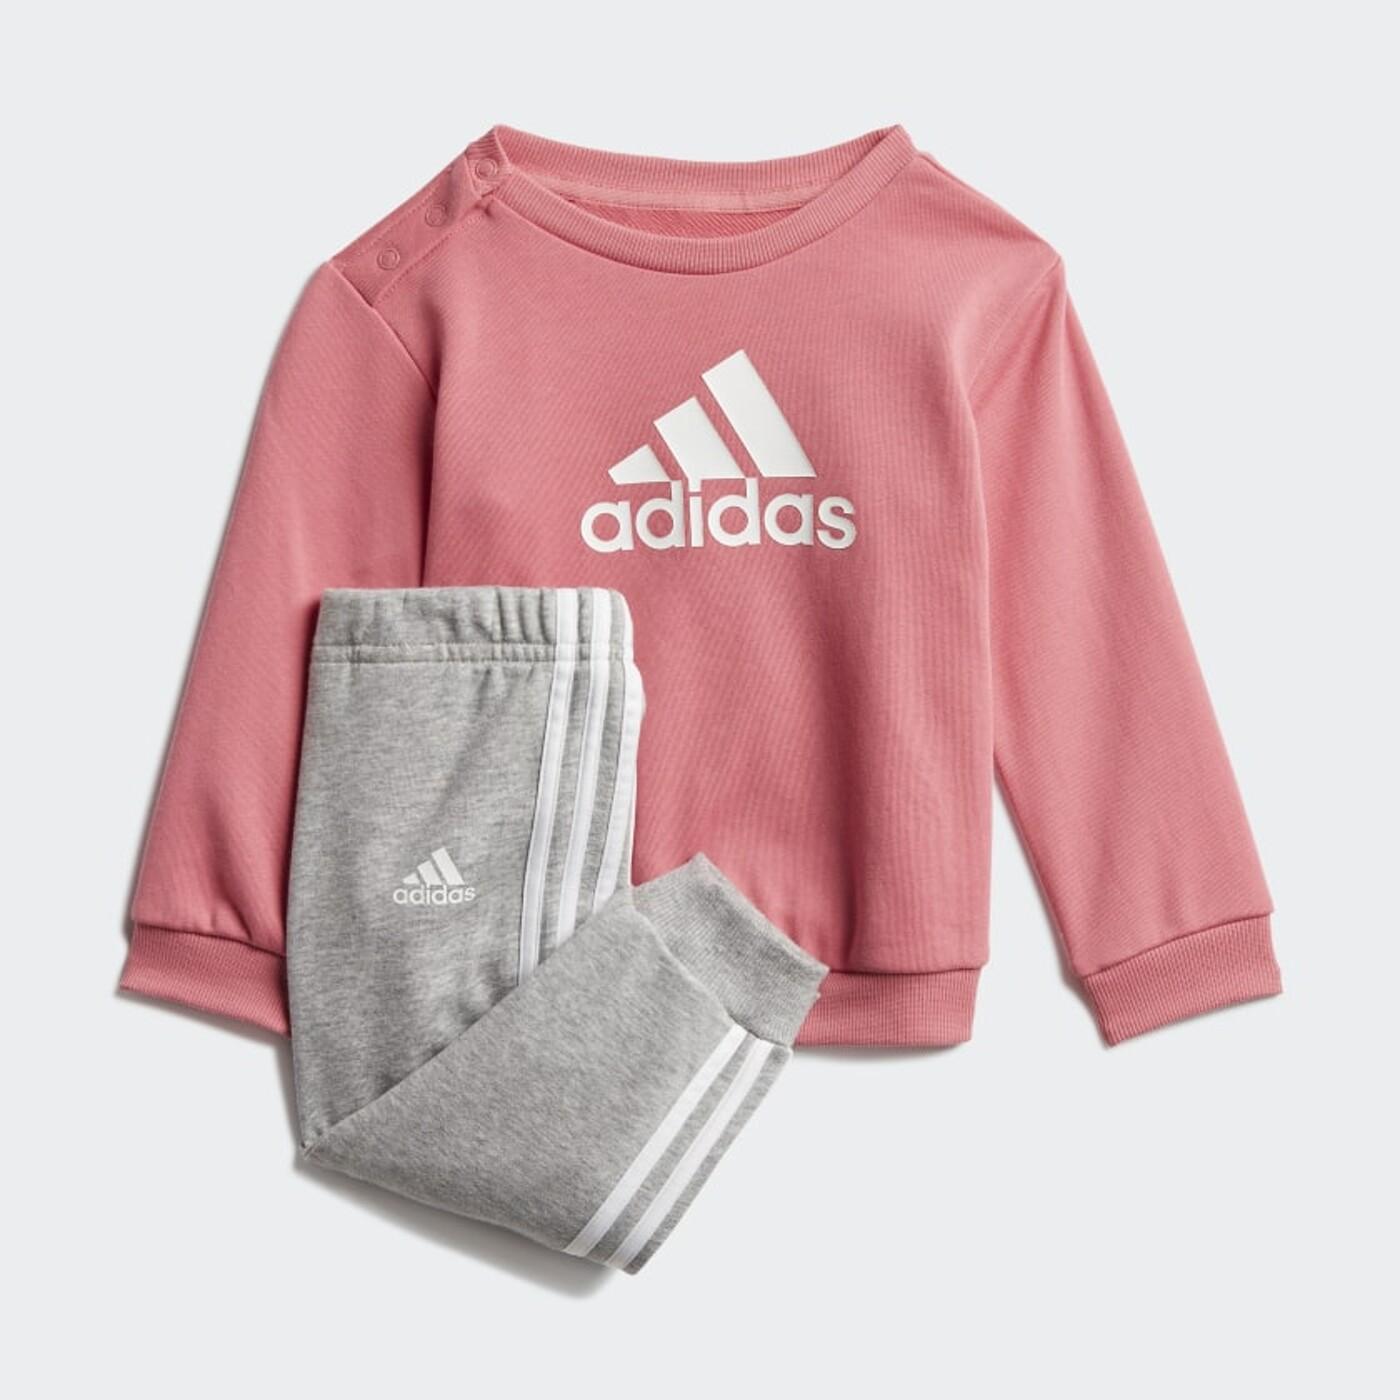 Jogger I BOS Jog FT Adidas - Kinder